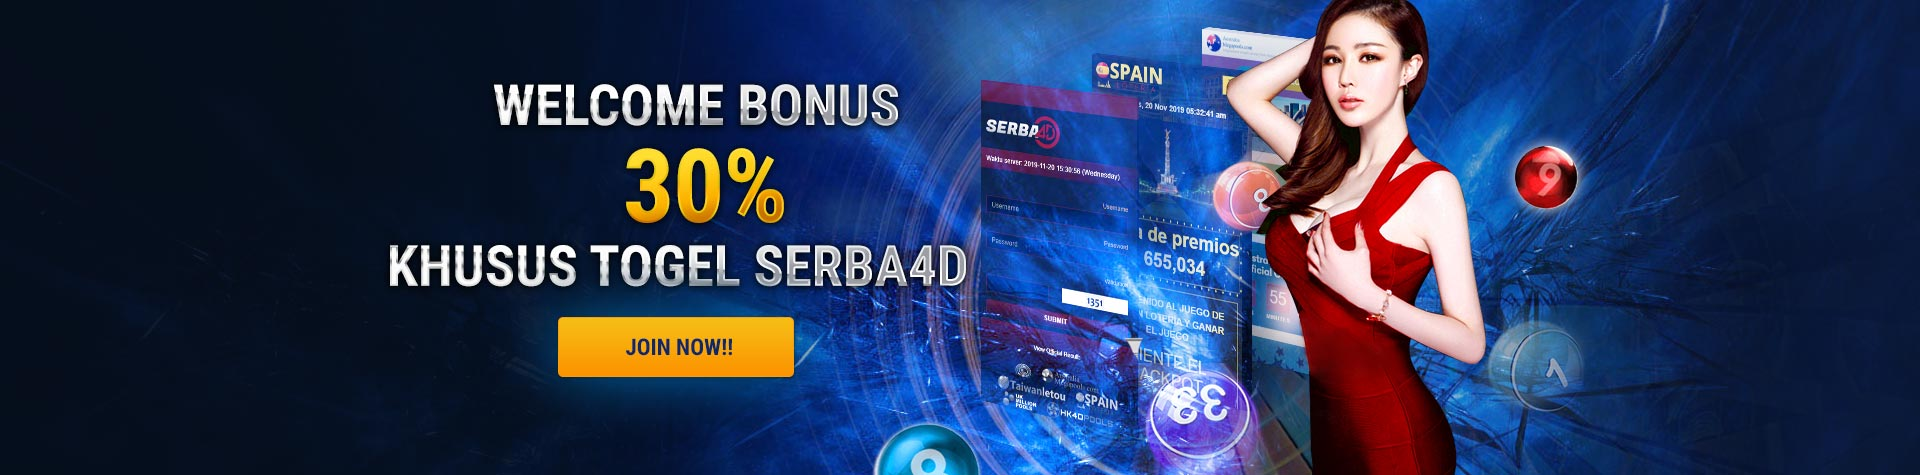 Slideshow Depobola Welcome Bonus 30 % Serba4D